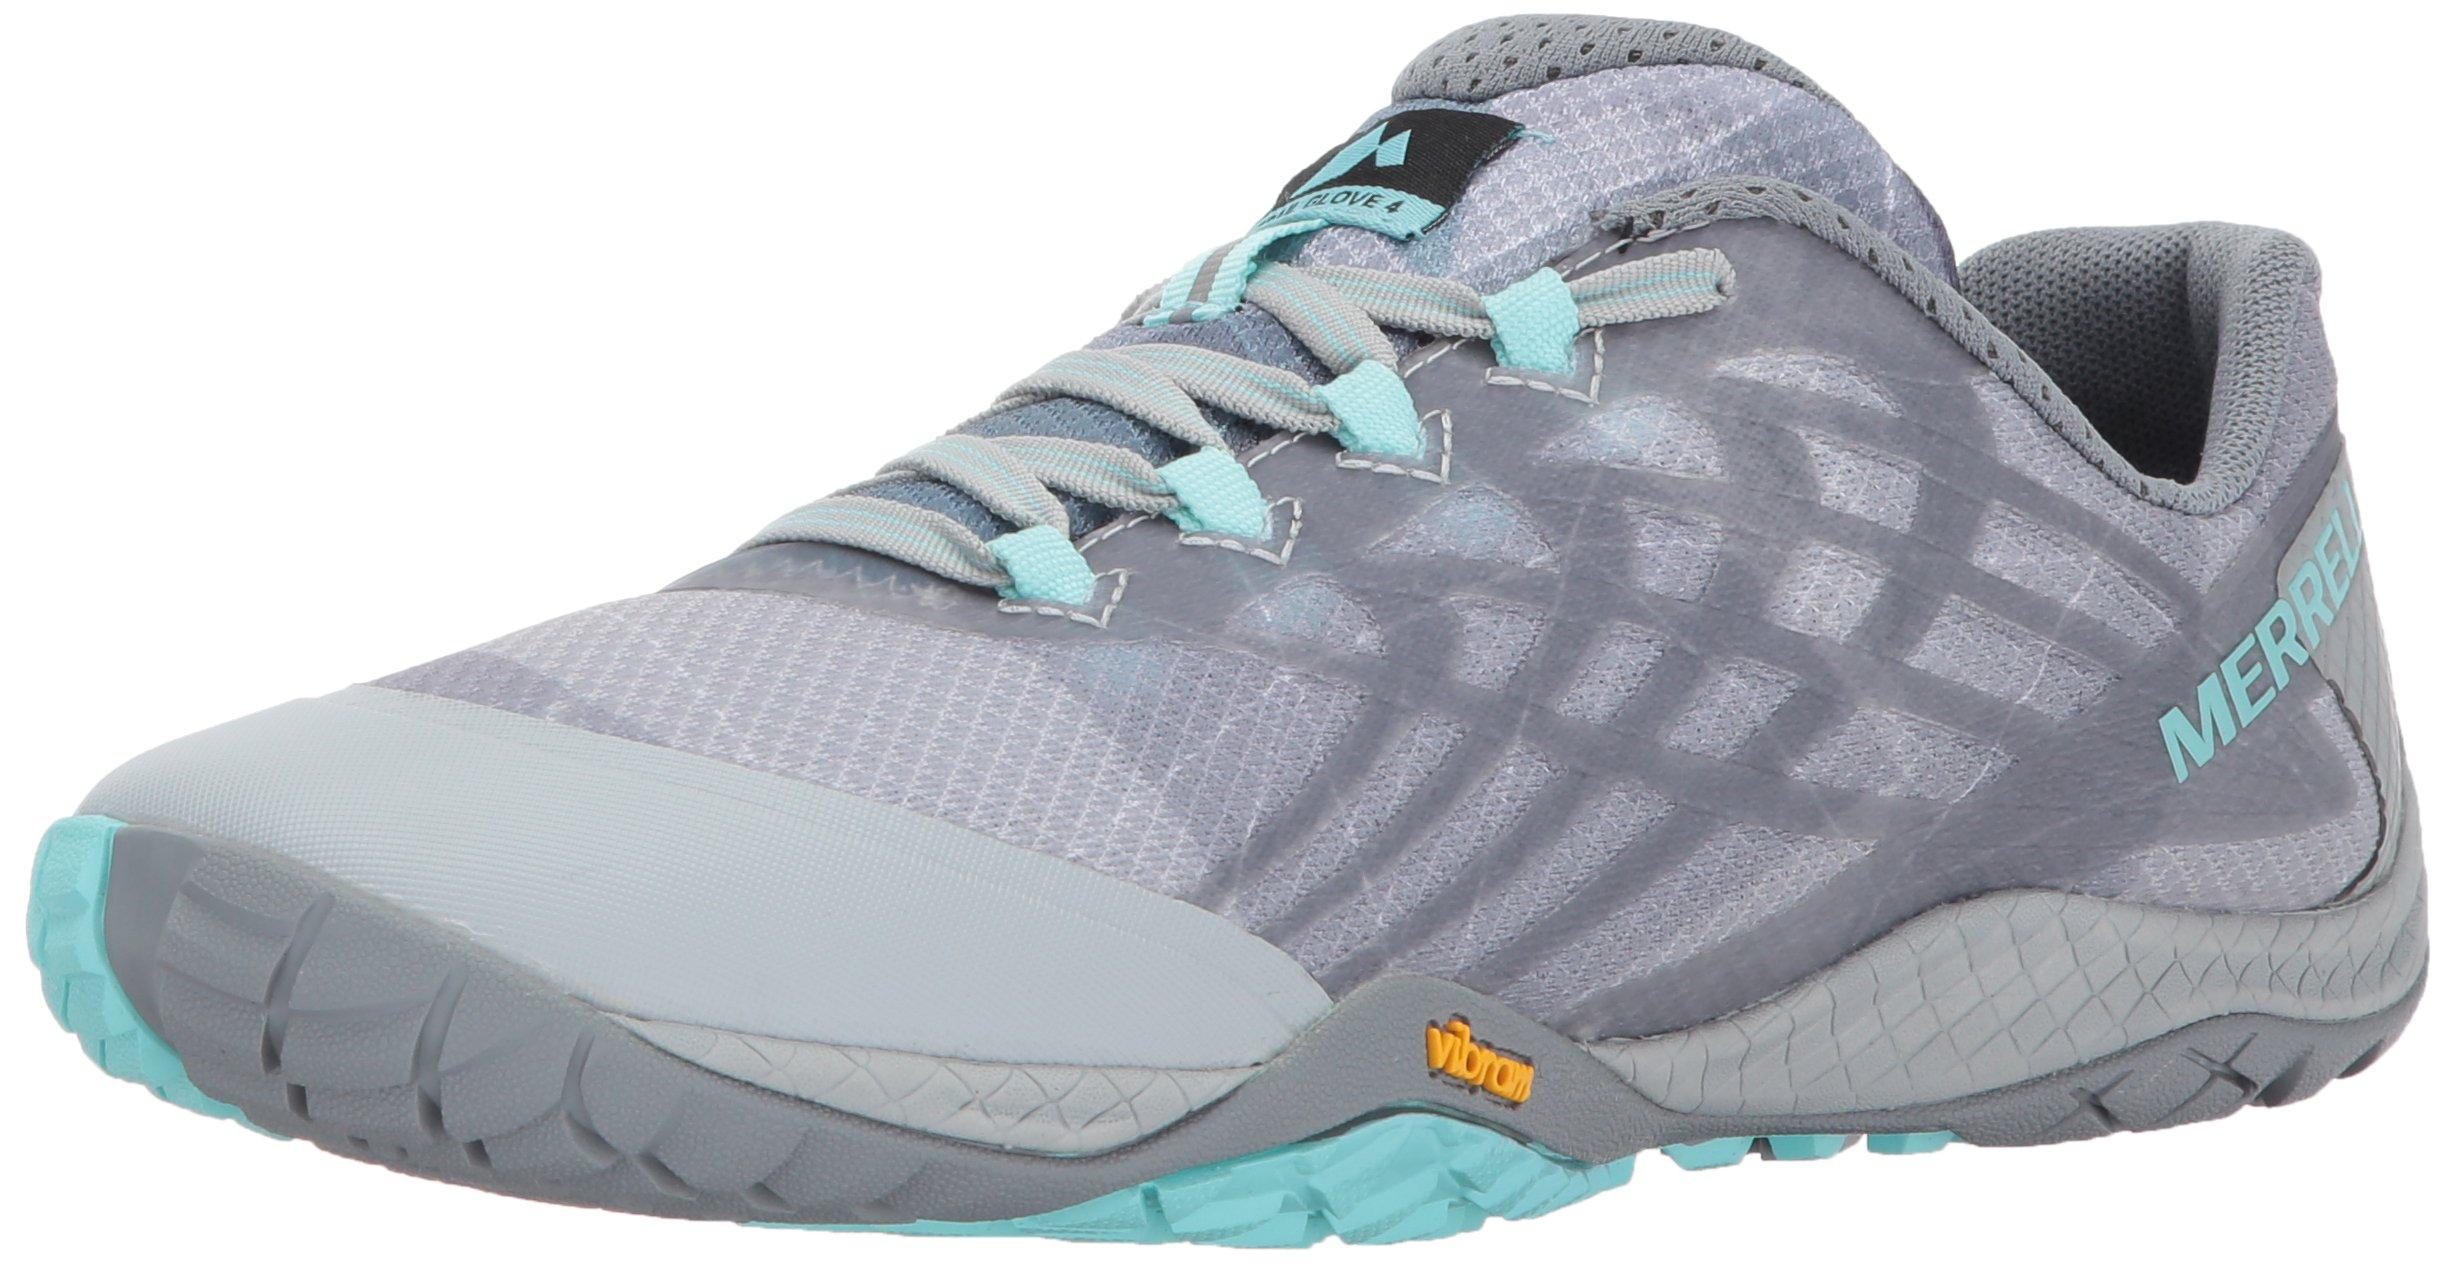 Merrell Women's Glove 4 Trail Runner,High Rise,9 M US